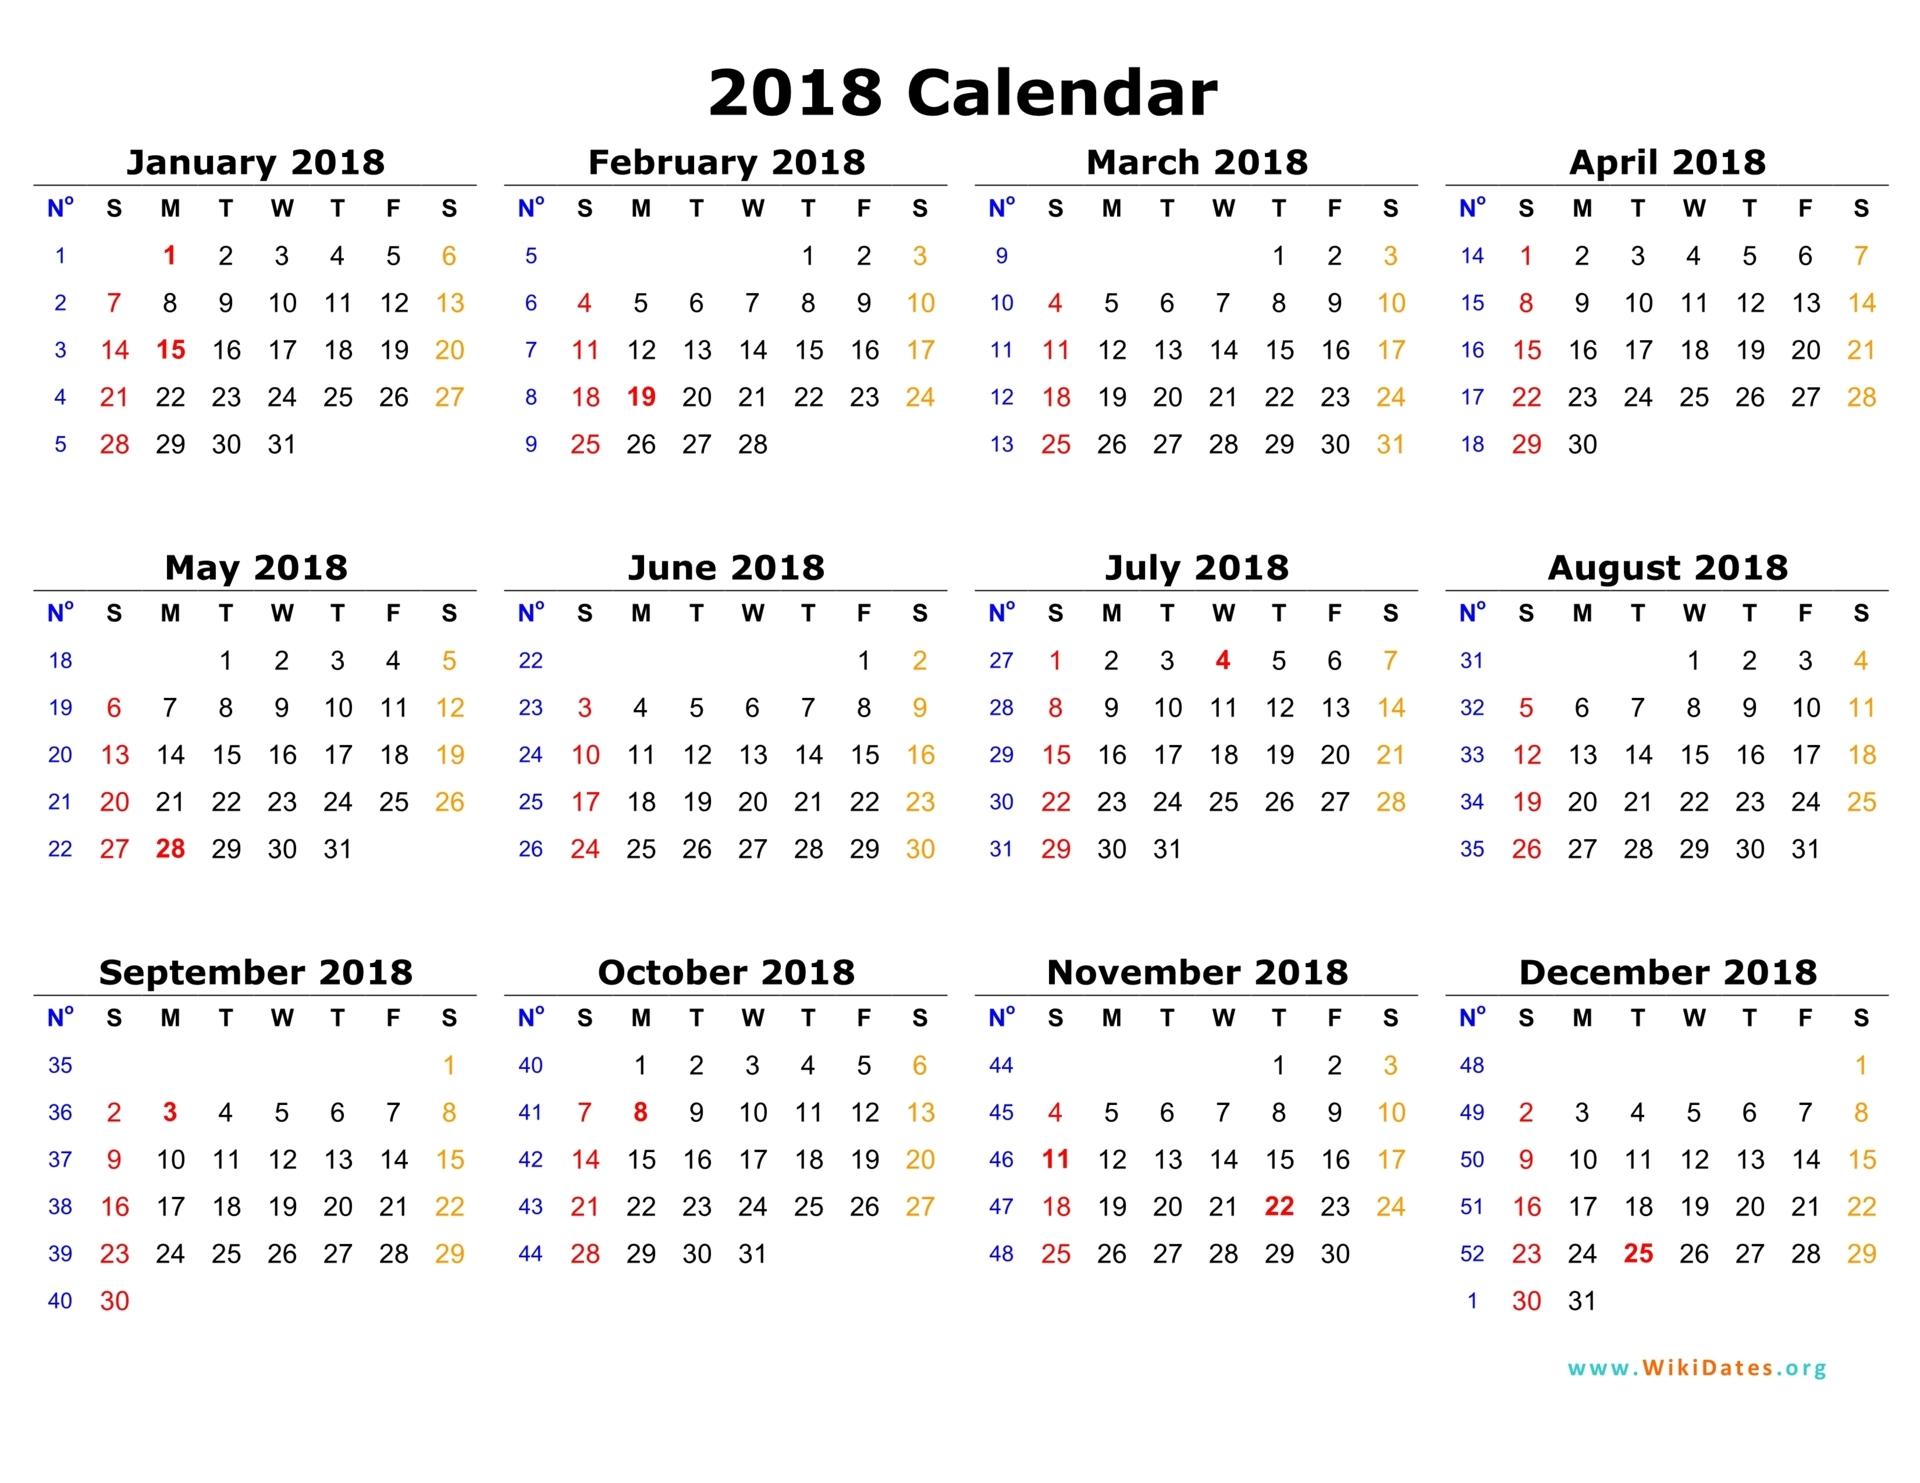 2018 Calendar | WikiDates.org